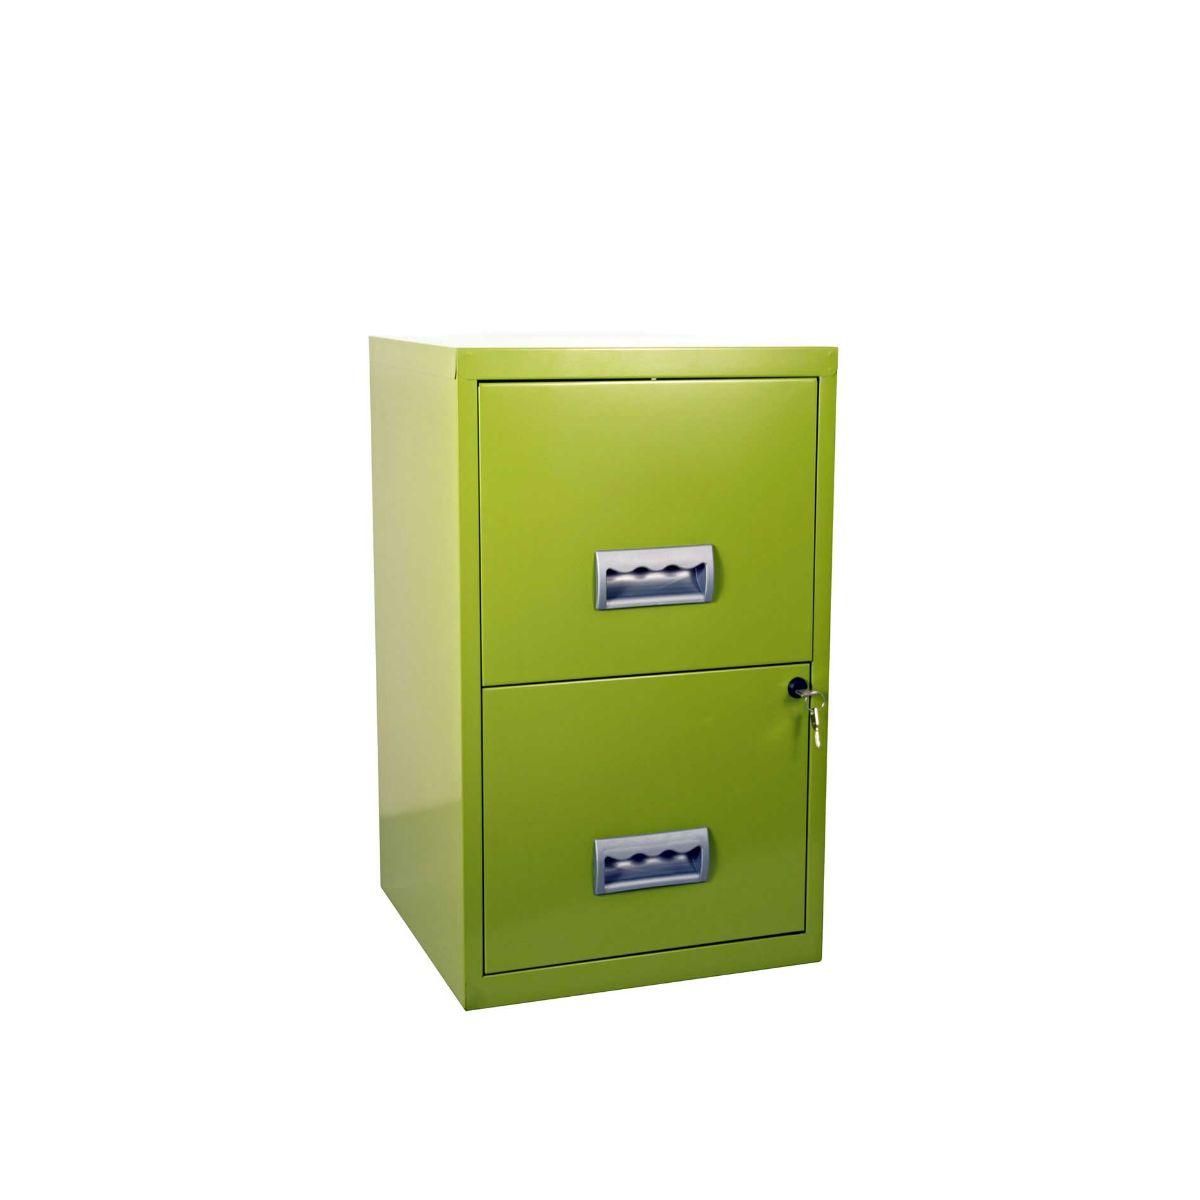 Green File Cabinet Green Filing Cabinets Storage Shelving Furniture Storage Ryman